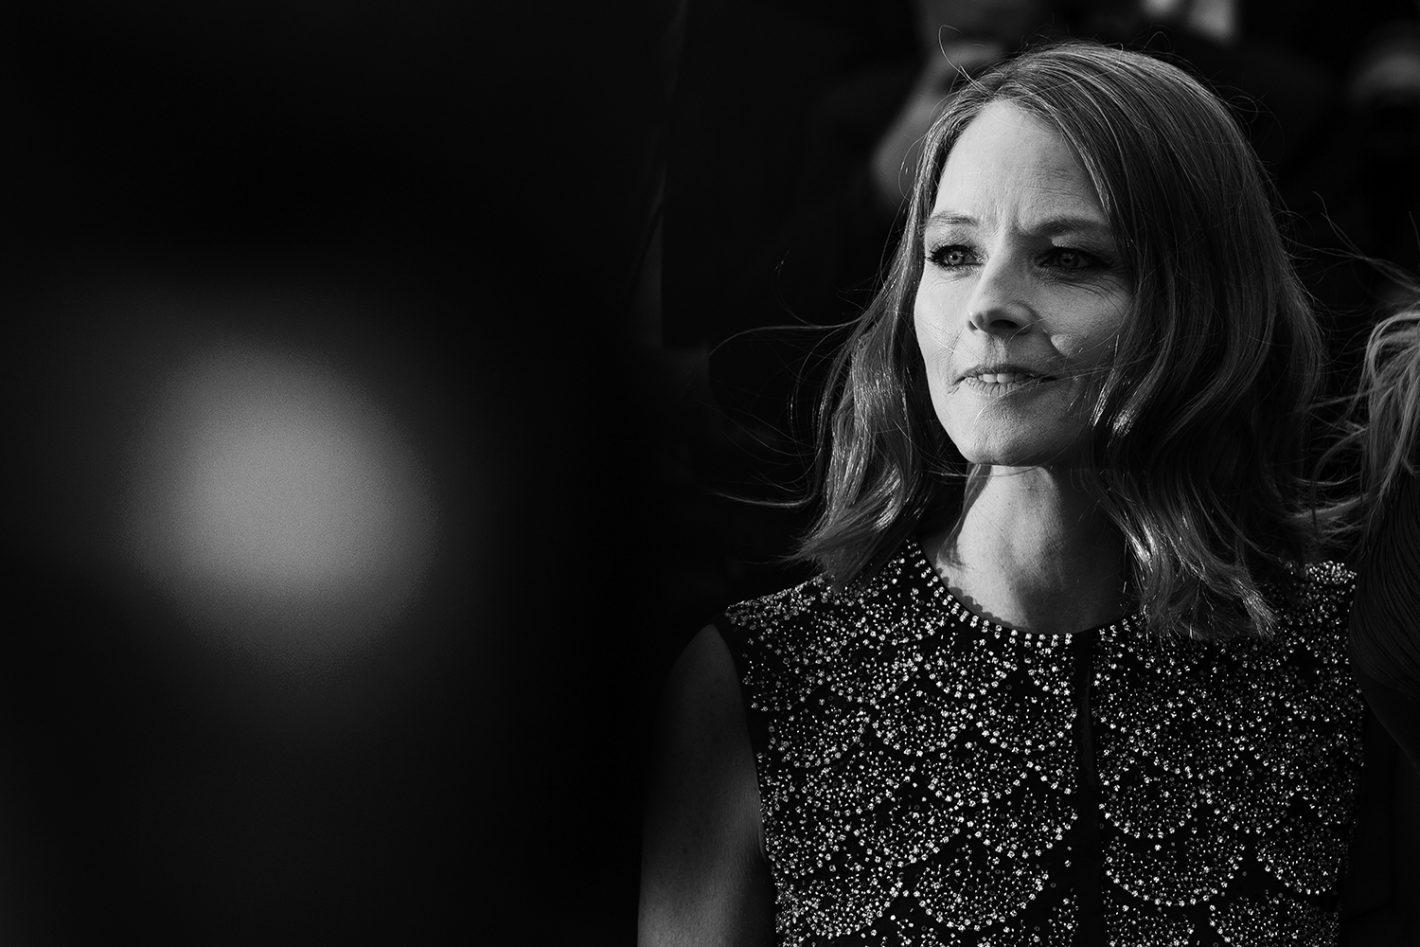 Festival de Cannes 2016 - Jodi Foster - Nikon D5